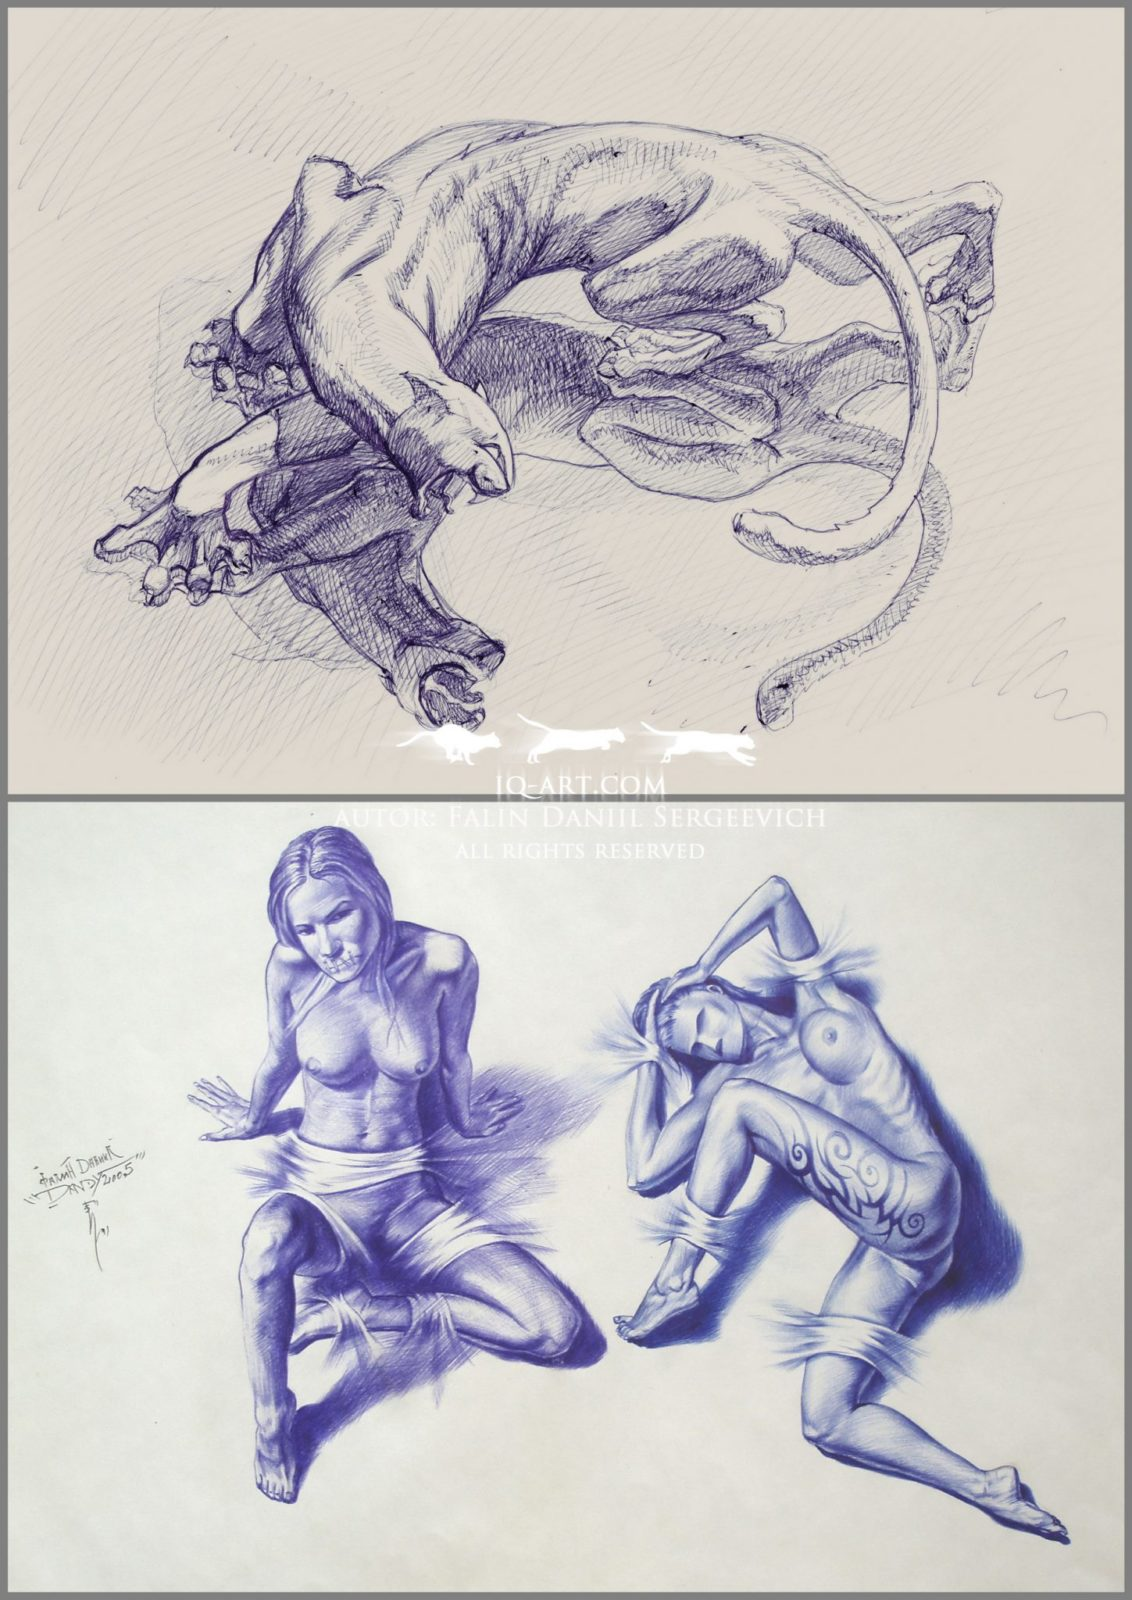 8oil_arts_draws